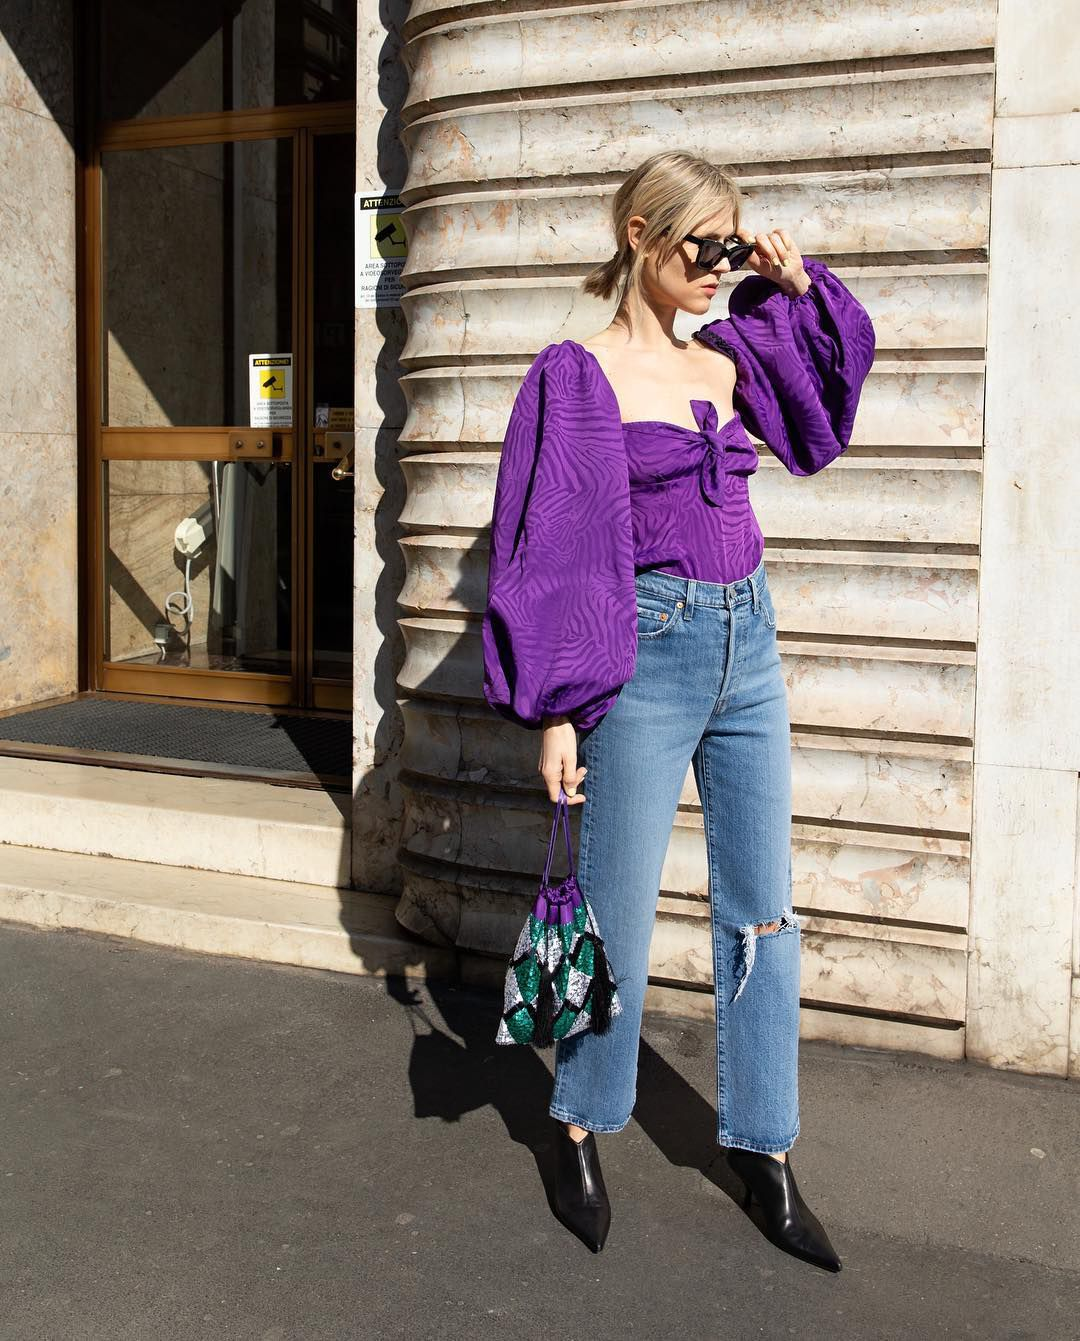 áo blouse tím túi xách volone kính mát